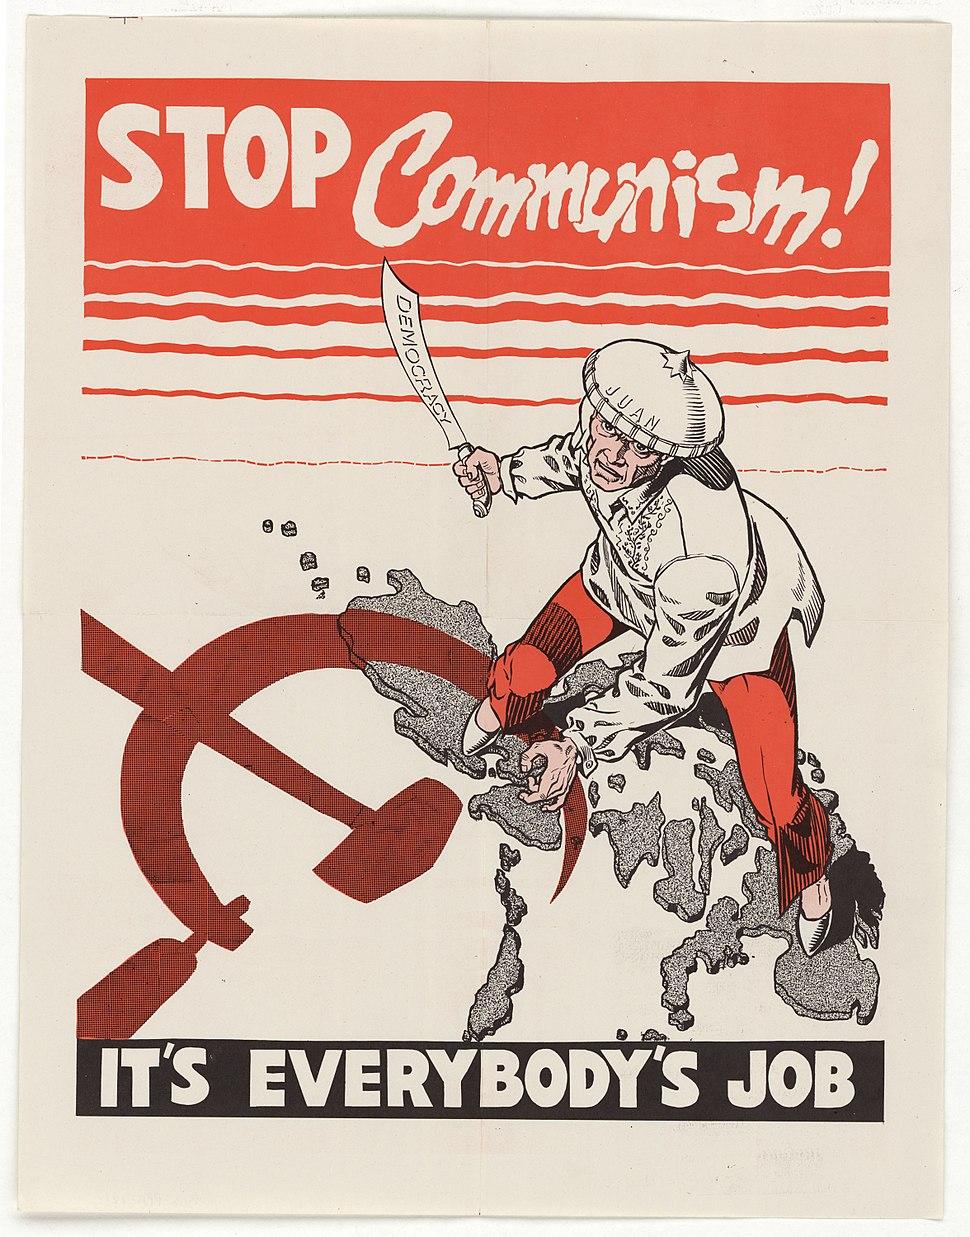 Stop Communism - NARA - 5730080